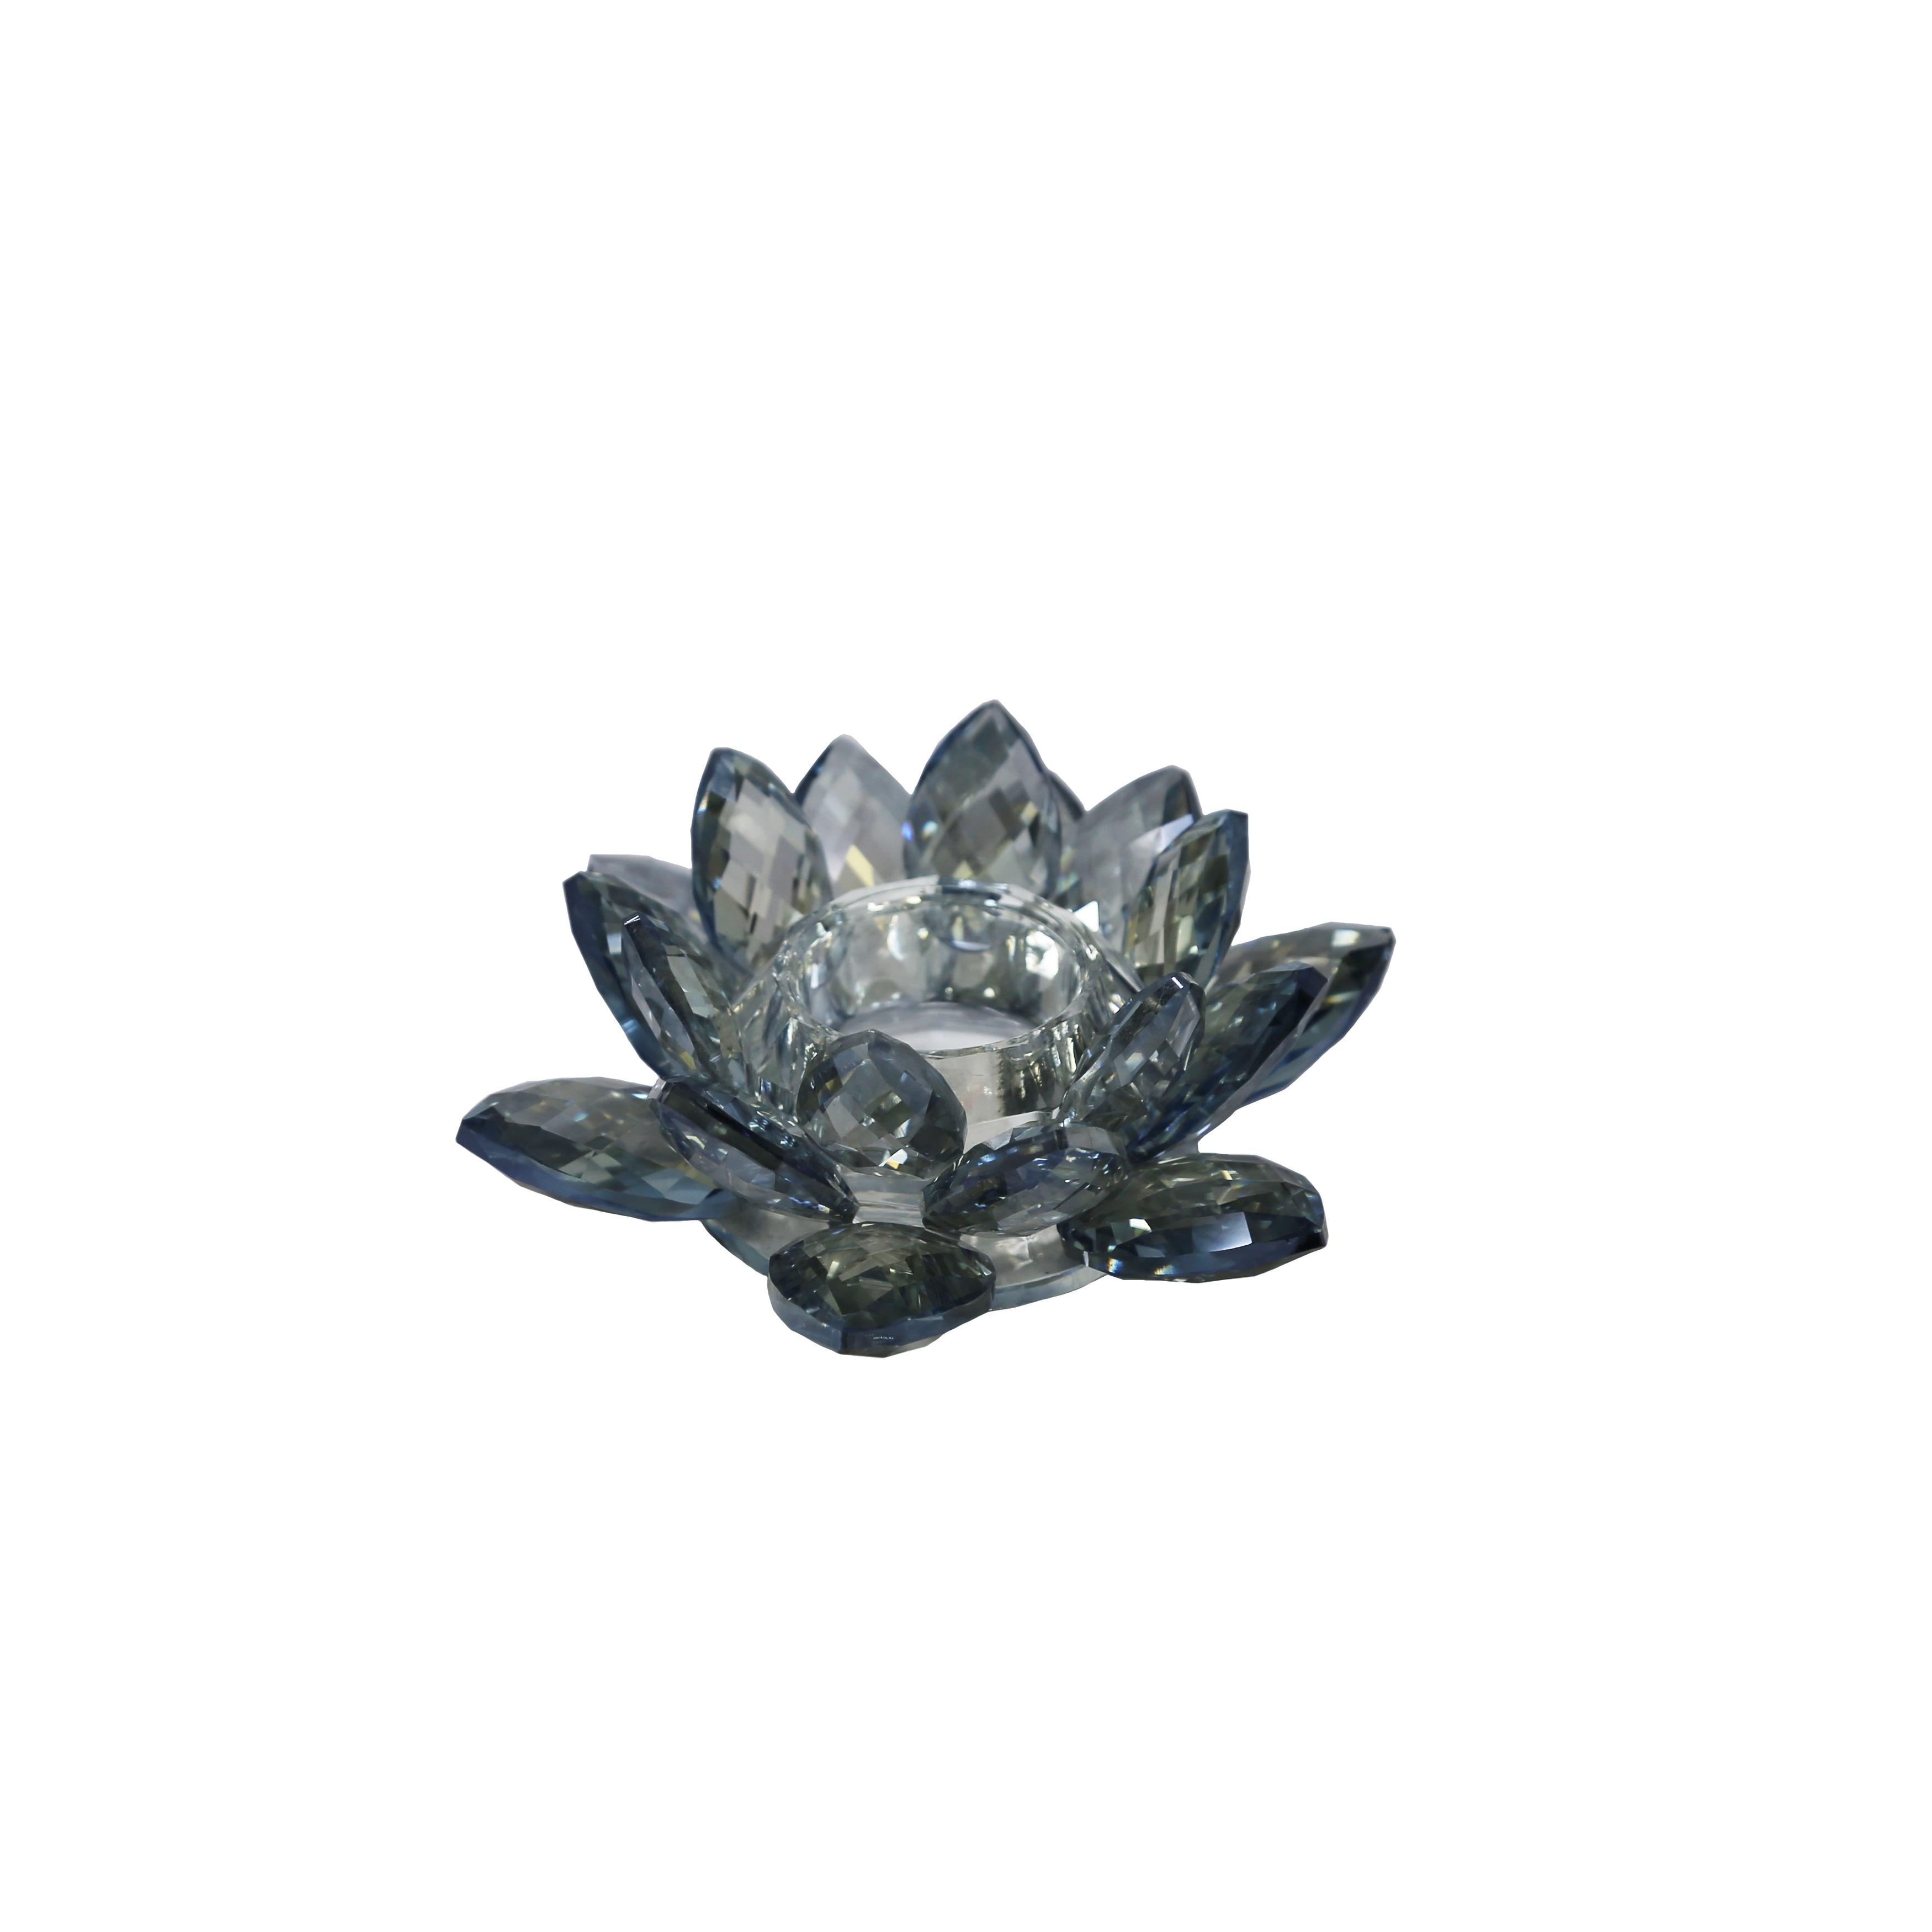 Decorative Crystal Lotus Votive Candle Holder, Blue